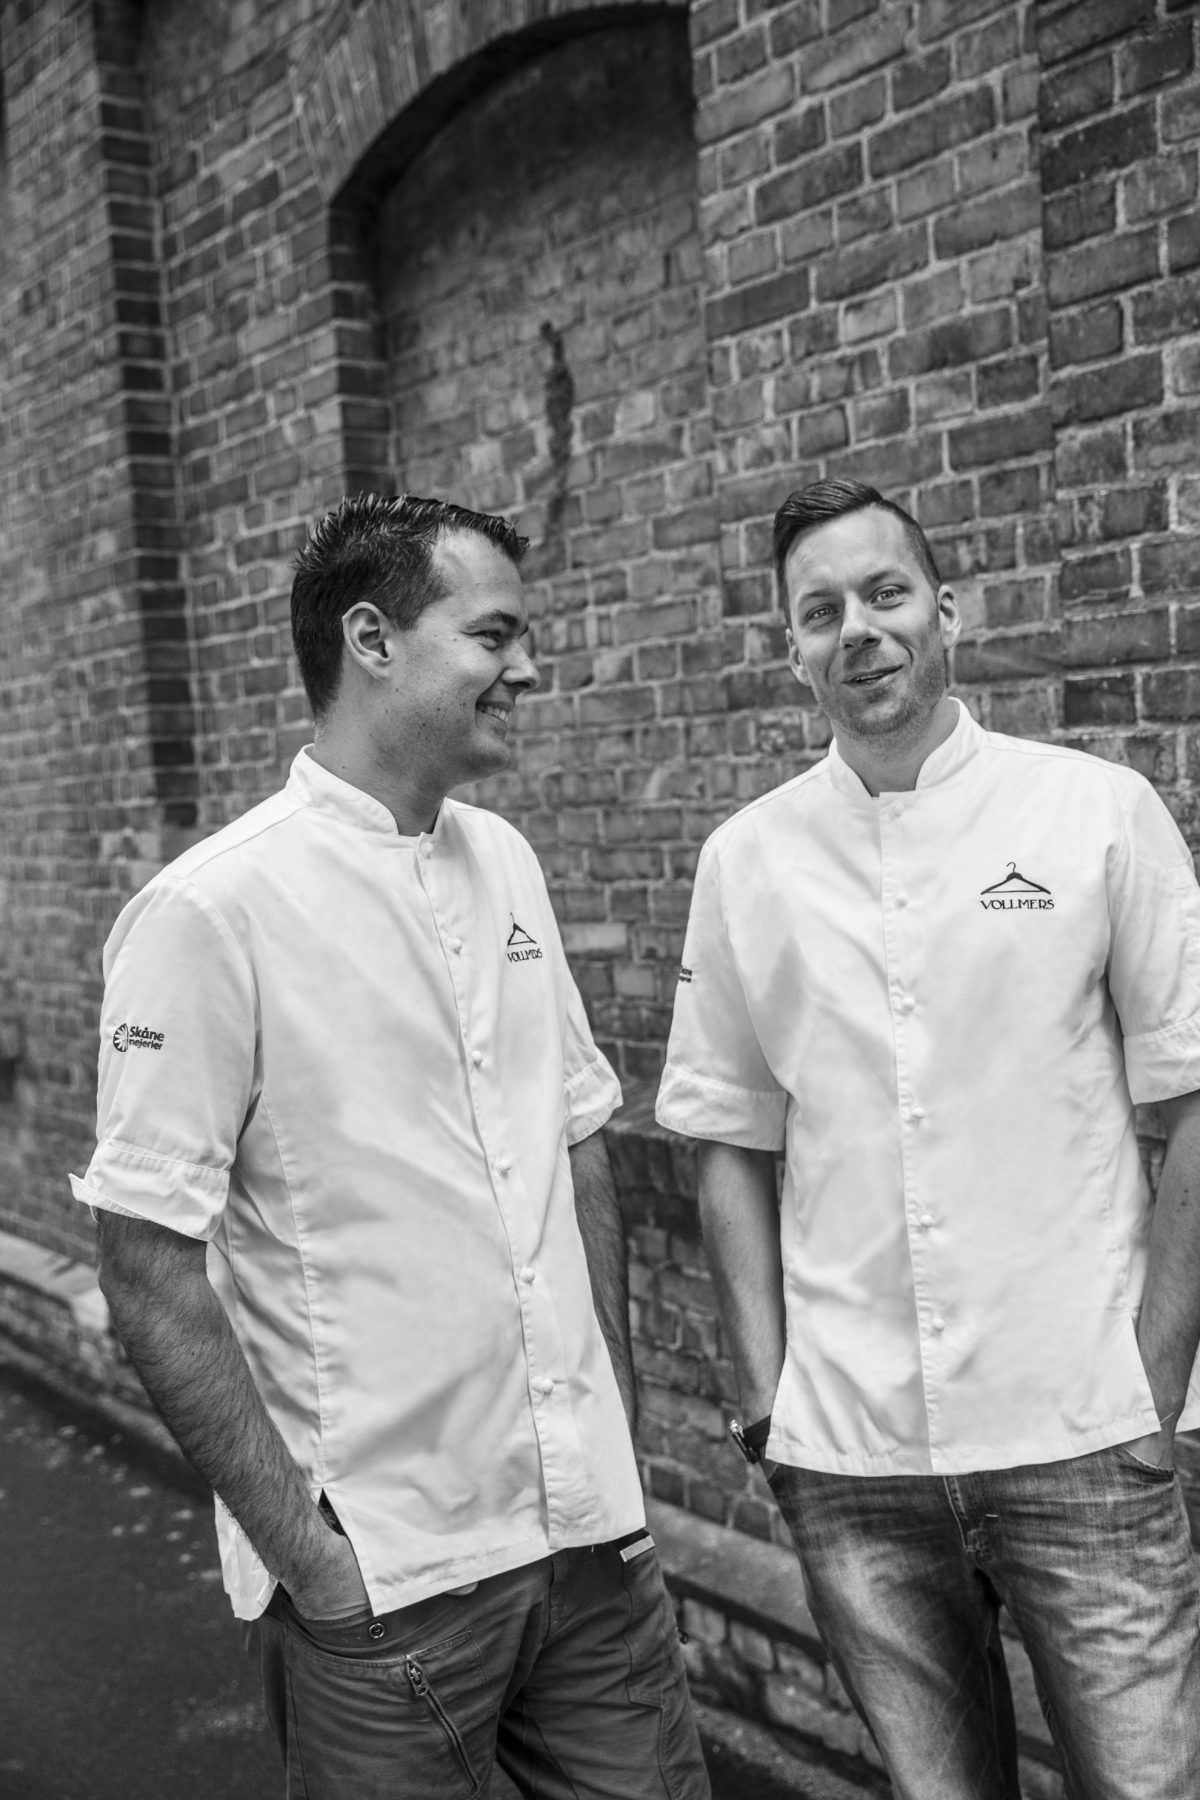 Mats y Ebbe Vollmer los chef 2* Michelin de Malmö<br> Foto: Sofia Håkansson